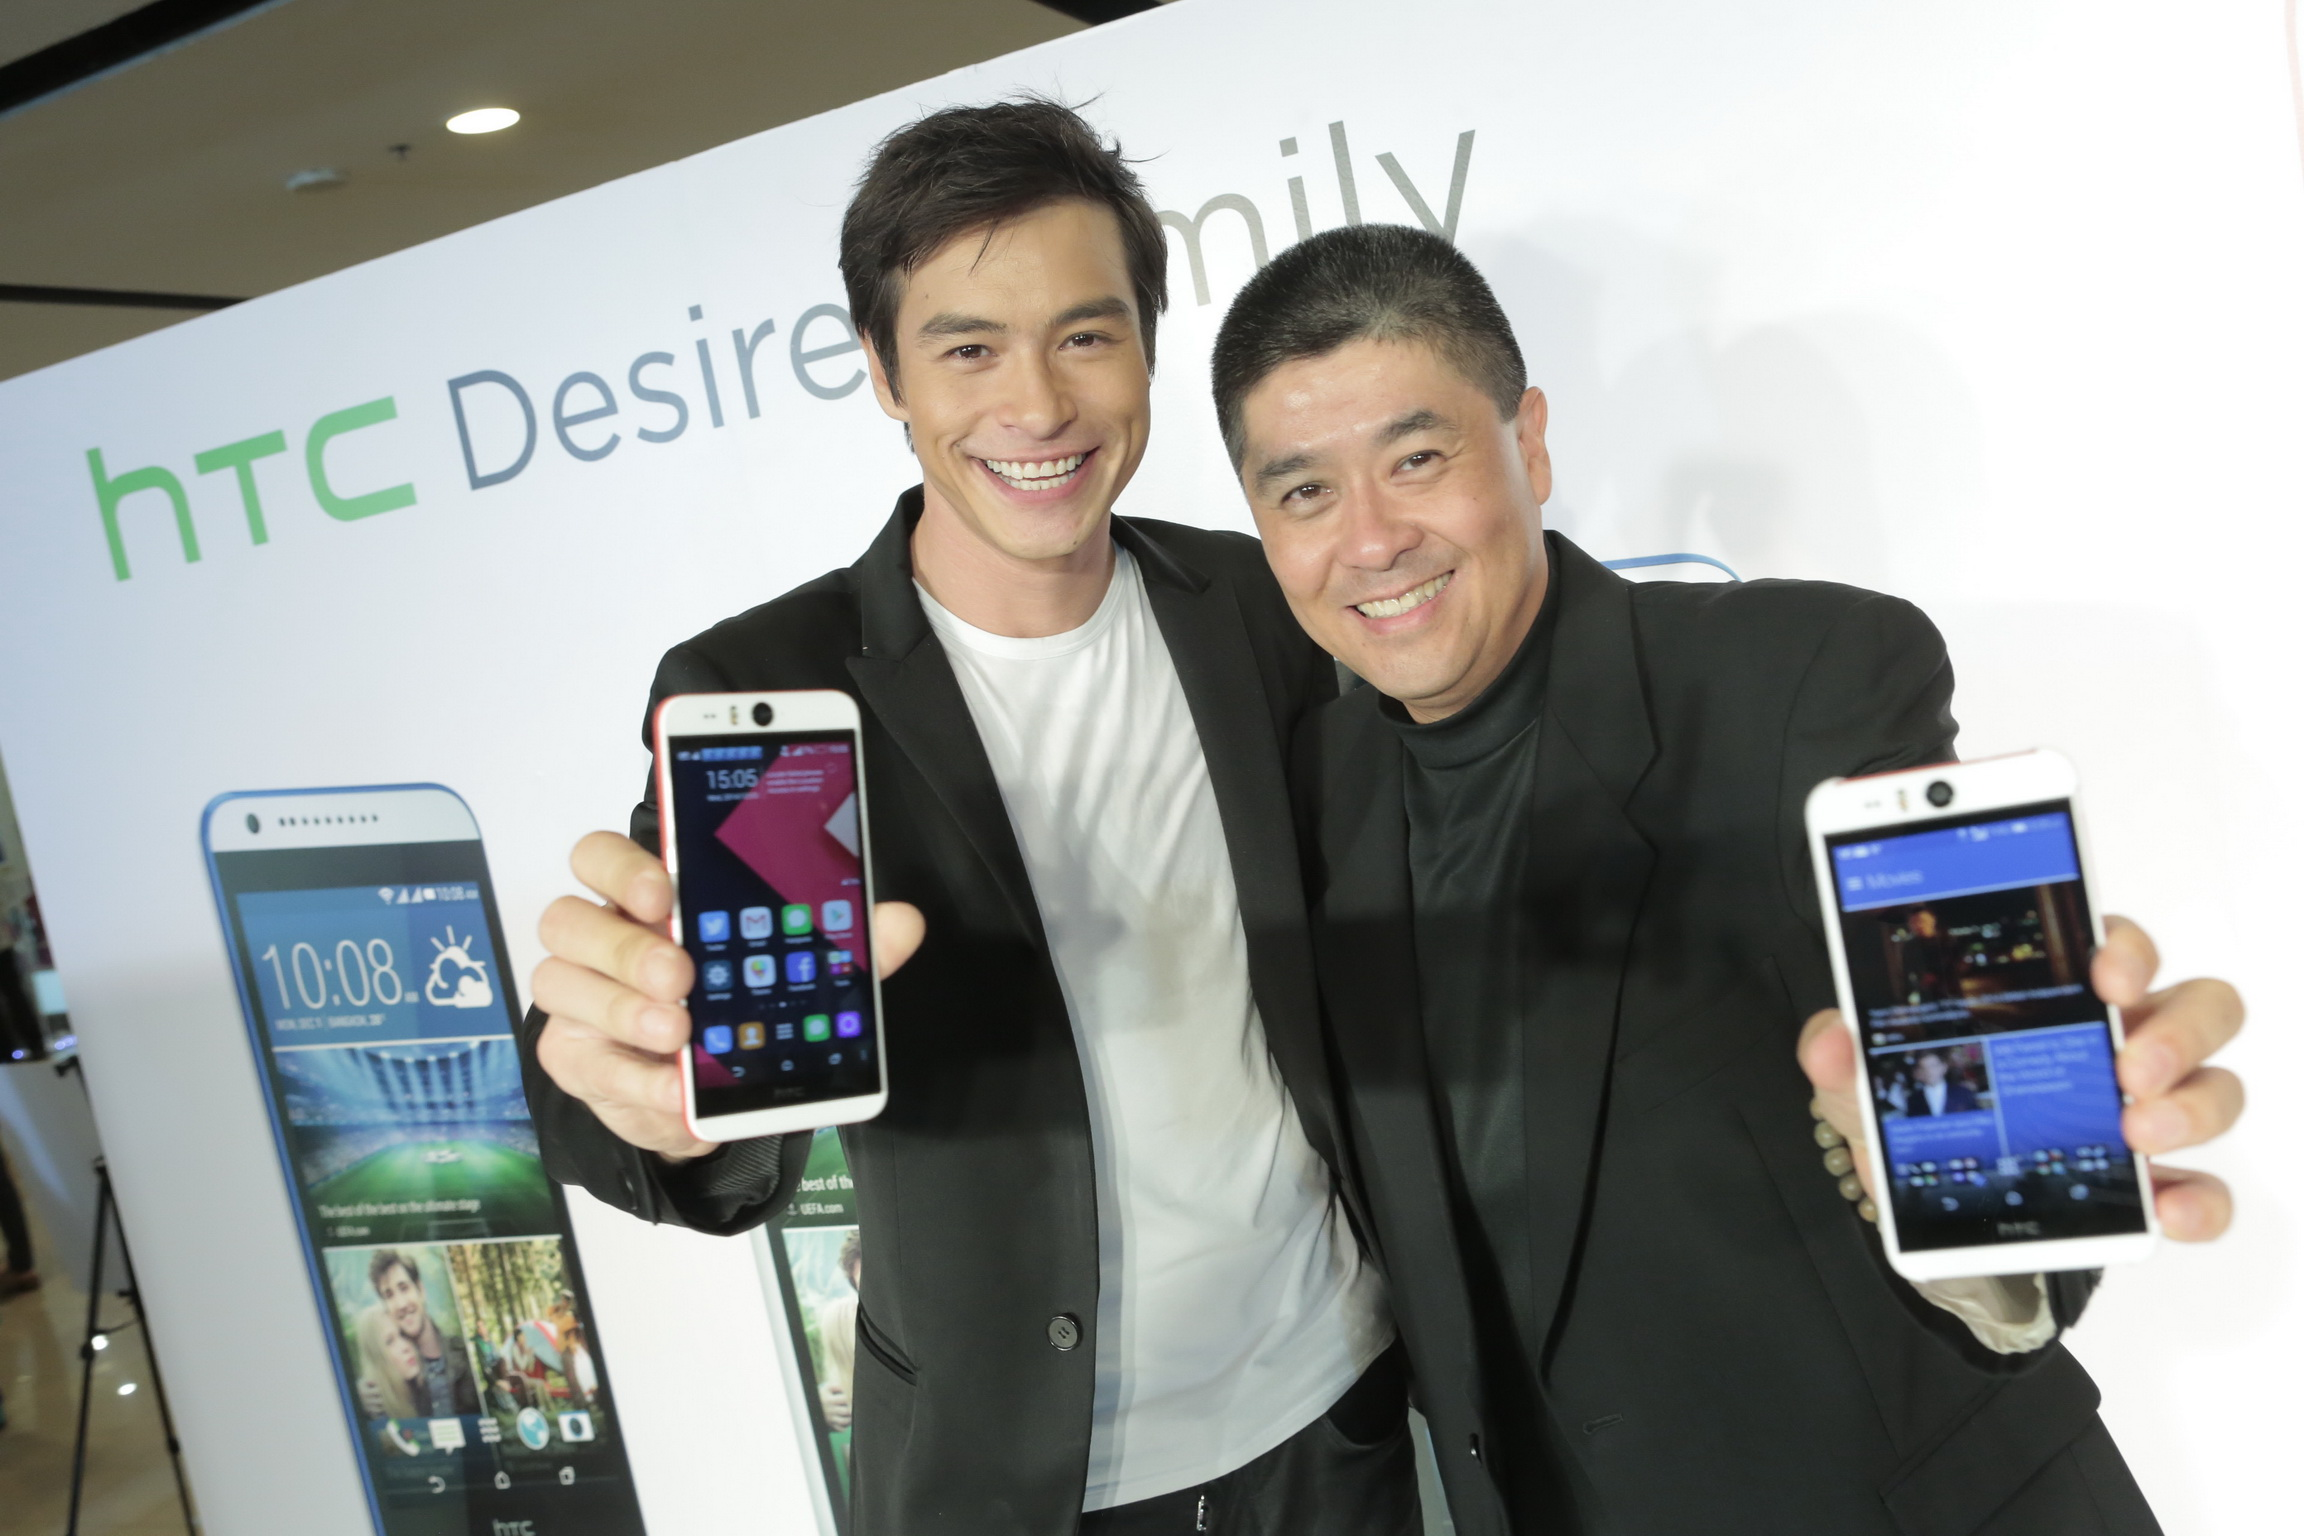 HTC Desire Family 006